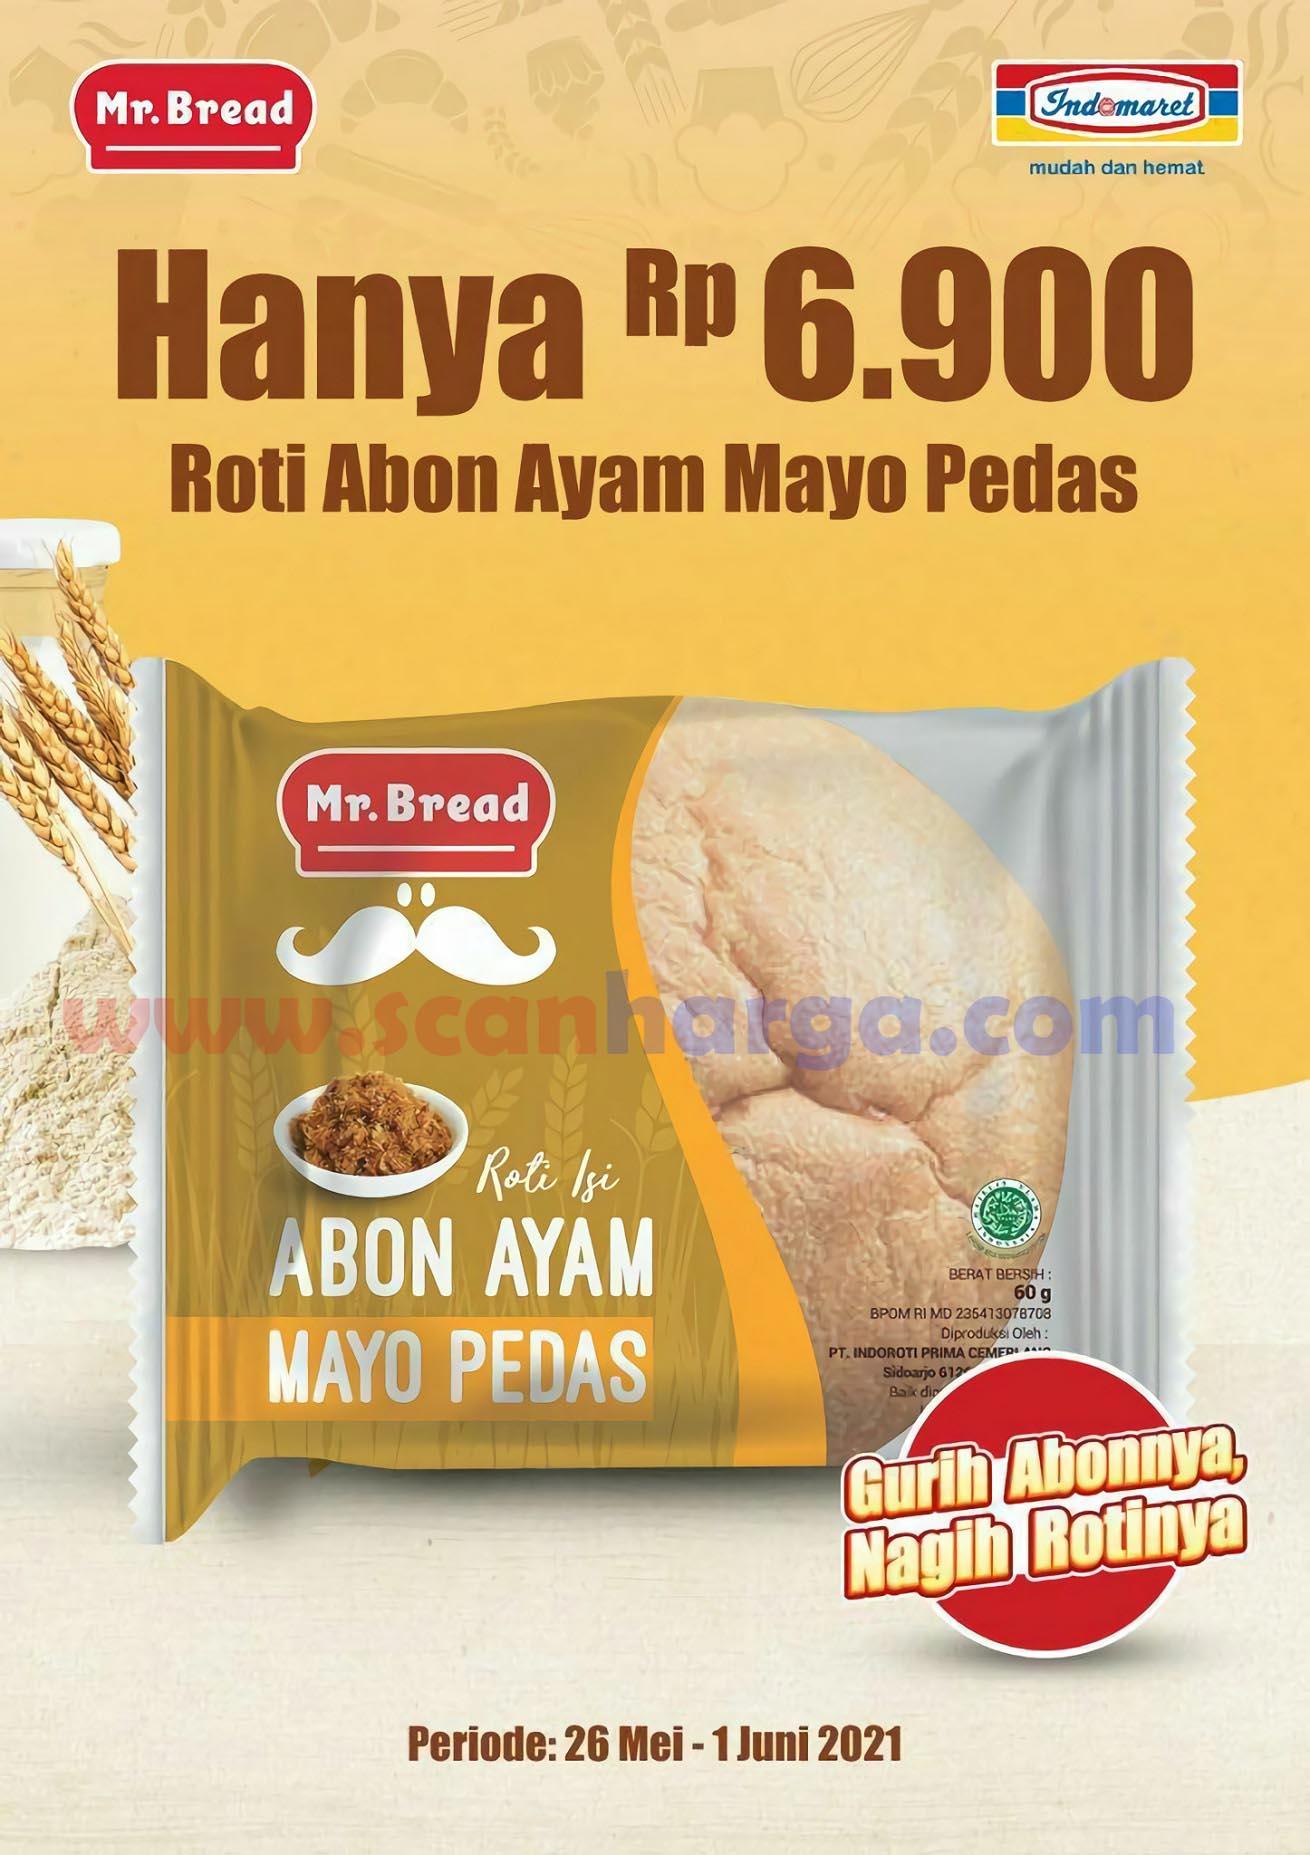 Promo MR BREAD - Harga Spesial Roti Abon Ayam Mayo Pedas hanya Rp.6.900